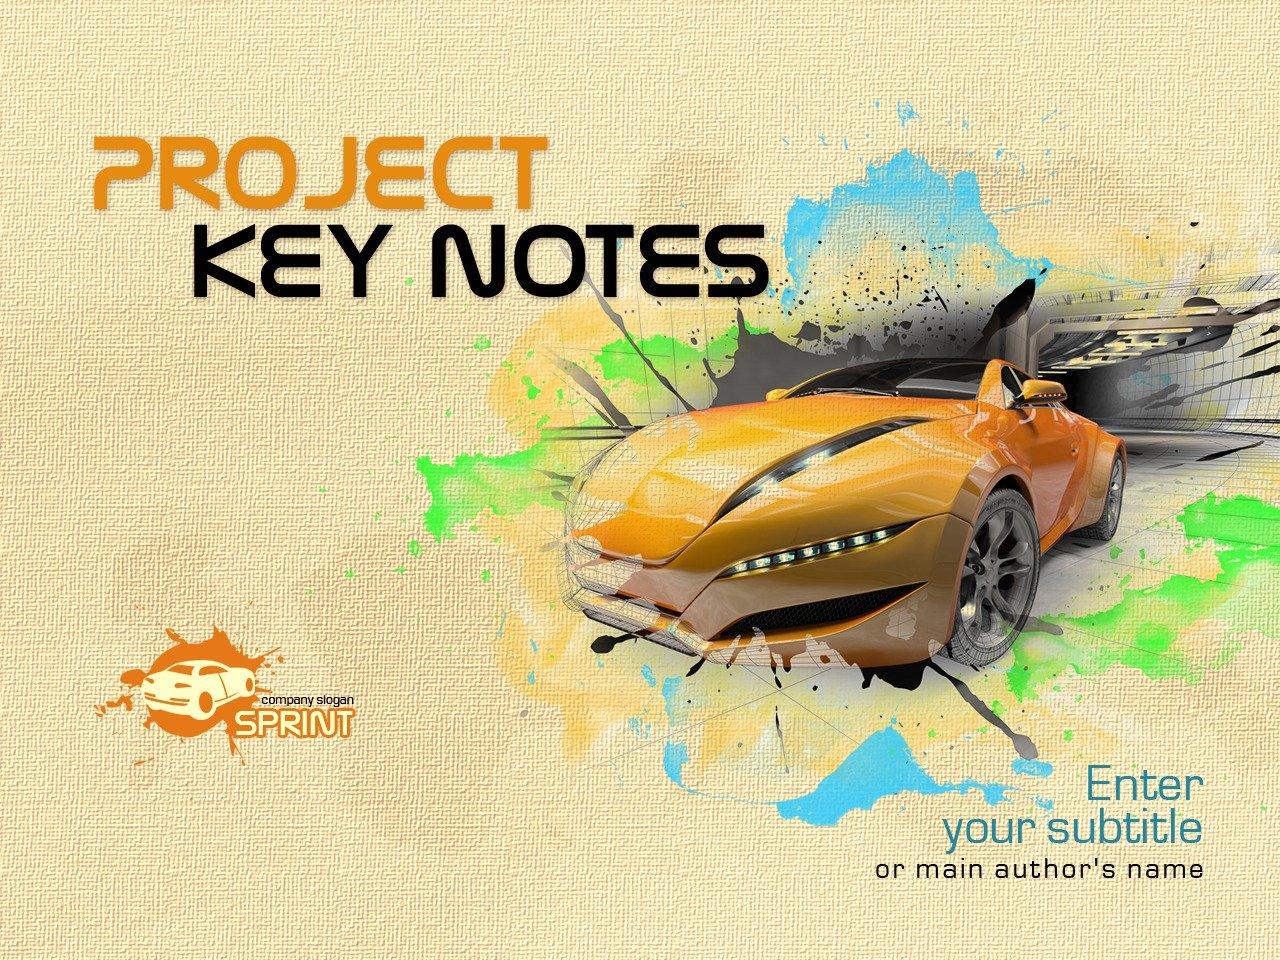 PowerPoint шаблон №33104 на тему автодилер